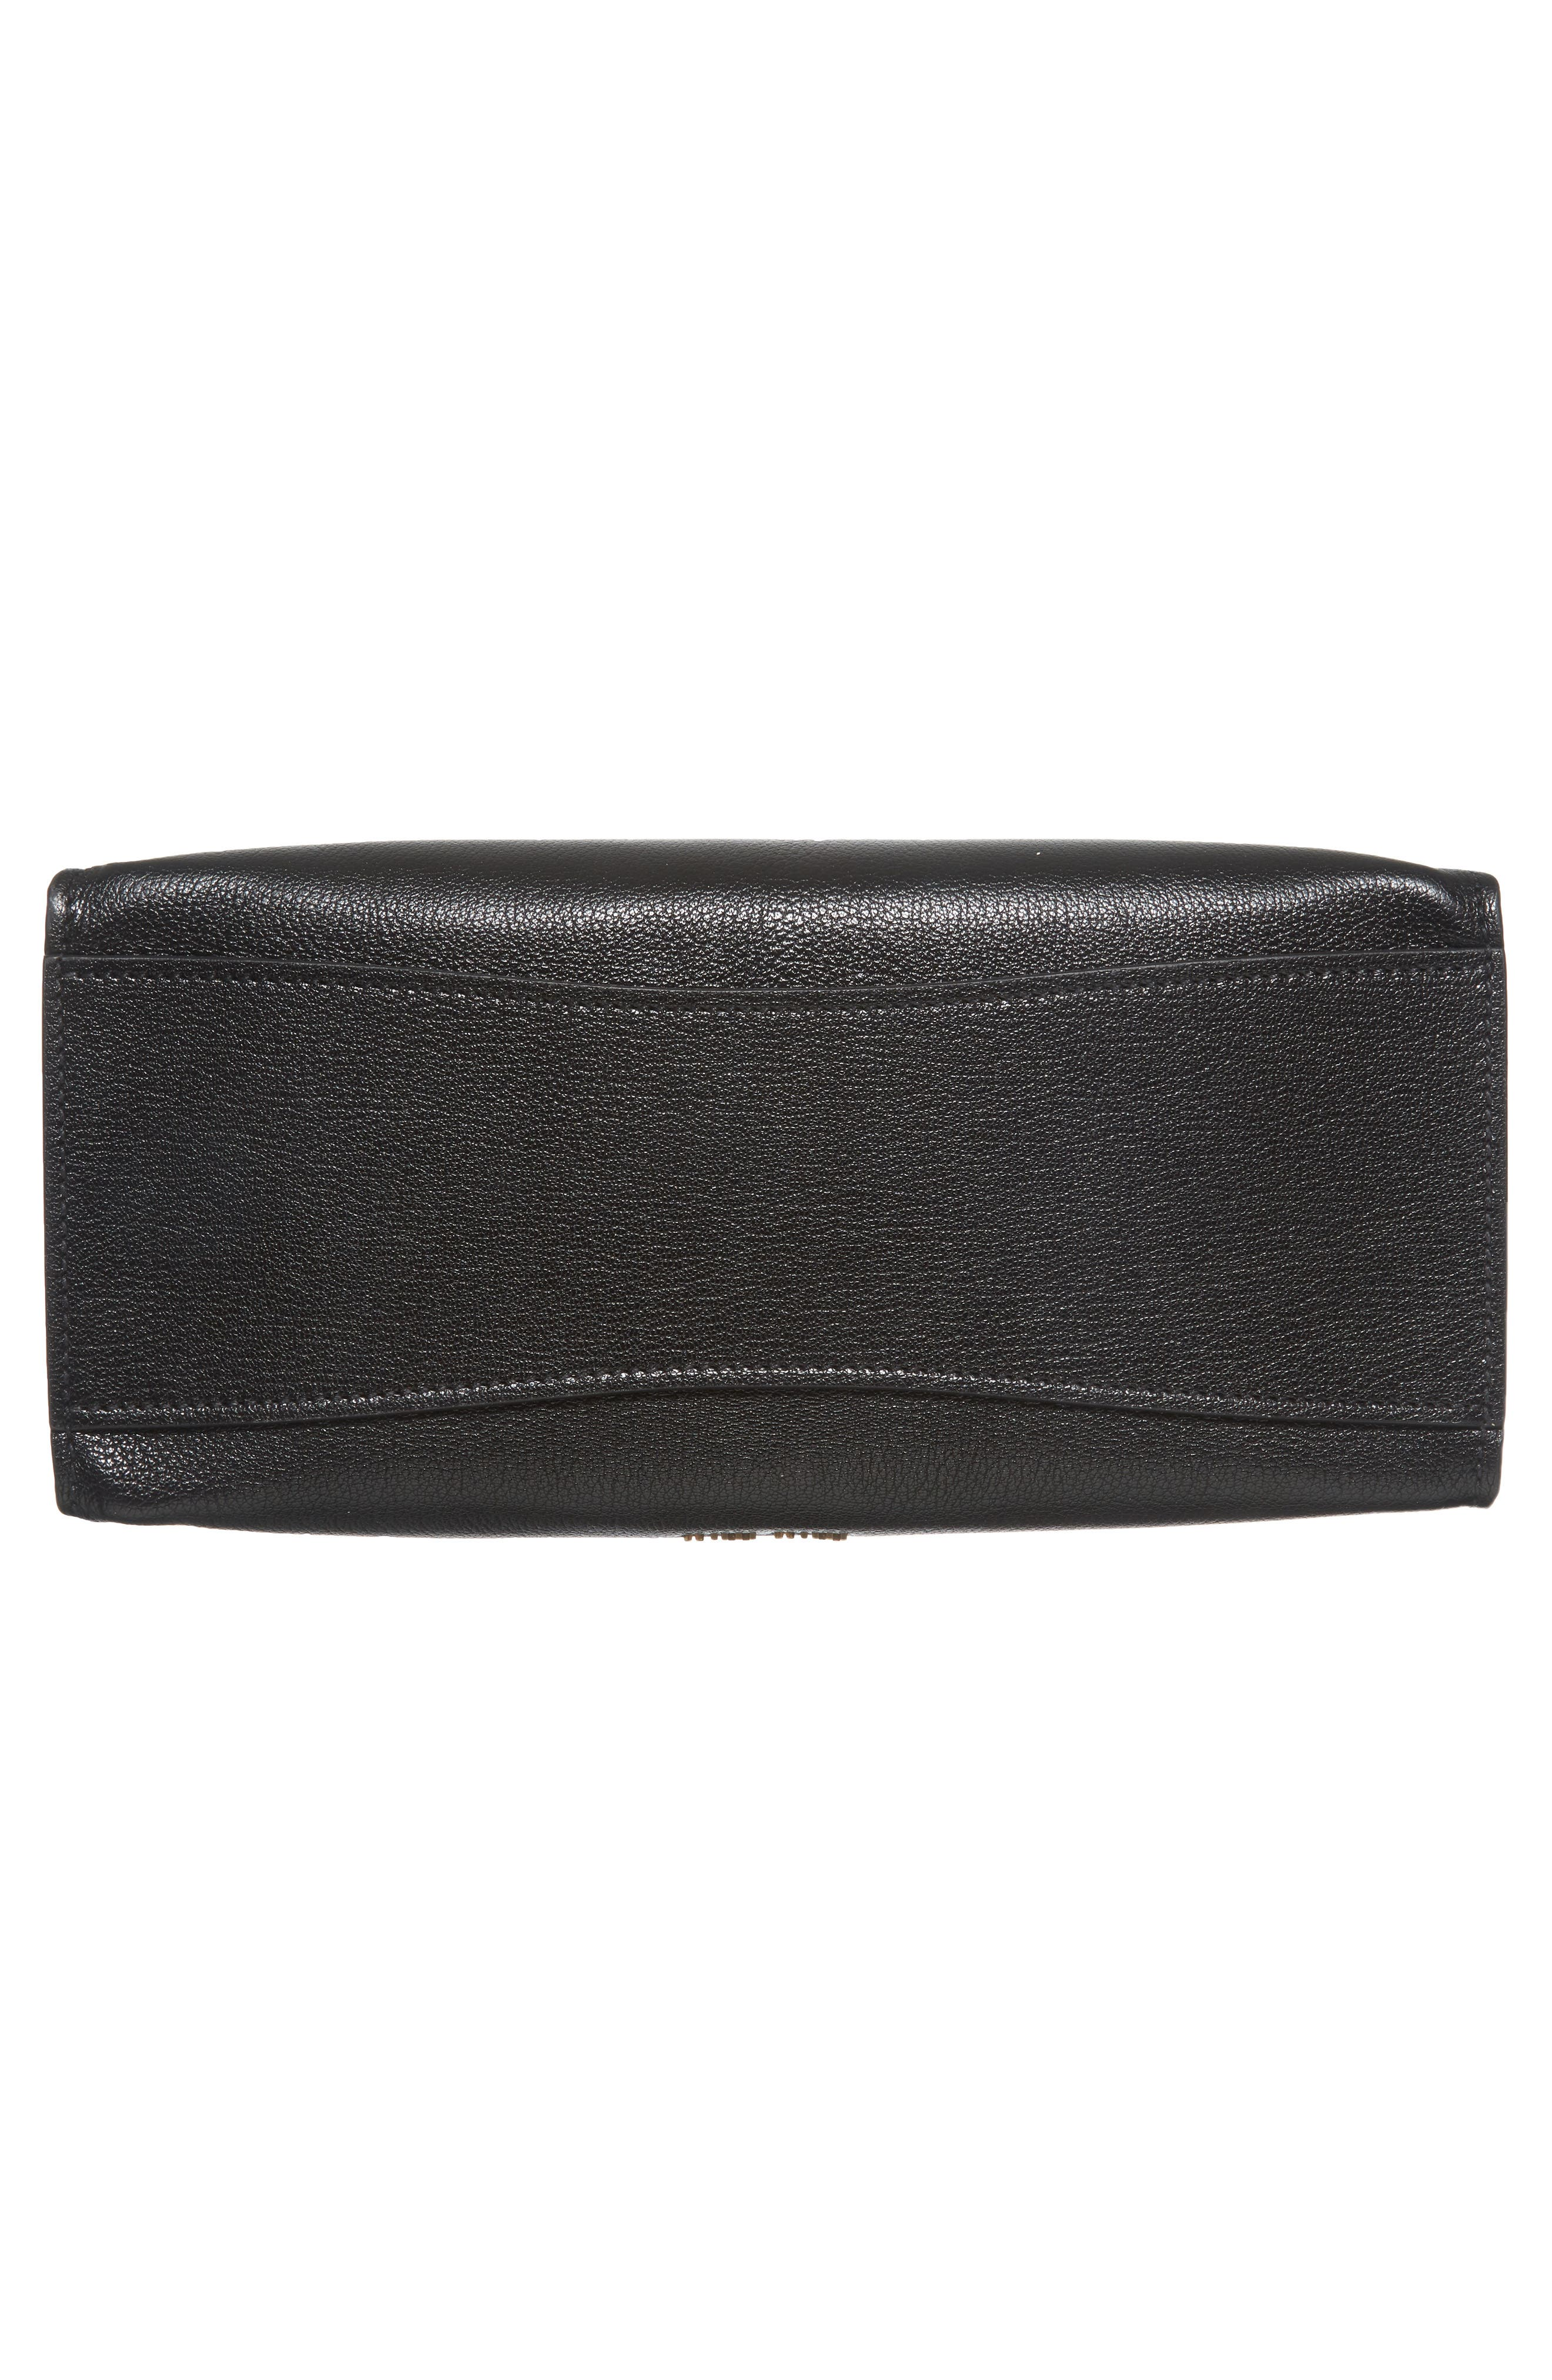 Madras Click Goatskin Leather Satchel,                             Alternate thumbnail 6, color,                             Black